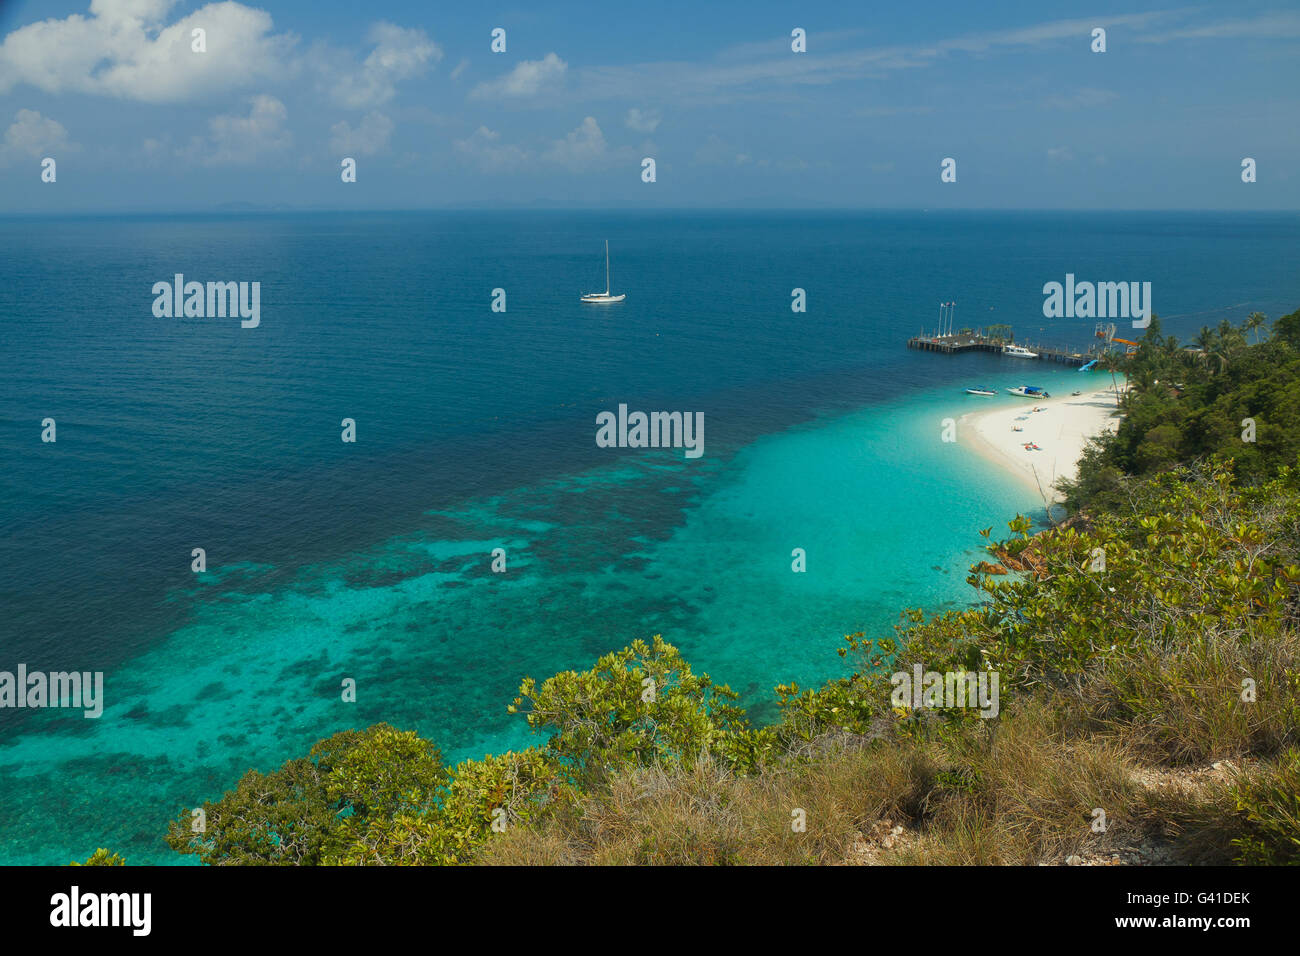 Lagoon Tropical Island: Rawa Island Stock Photos & Rawa Island Stock Images